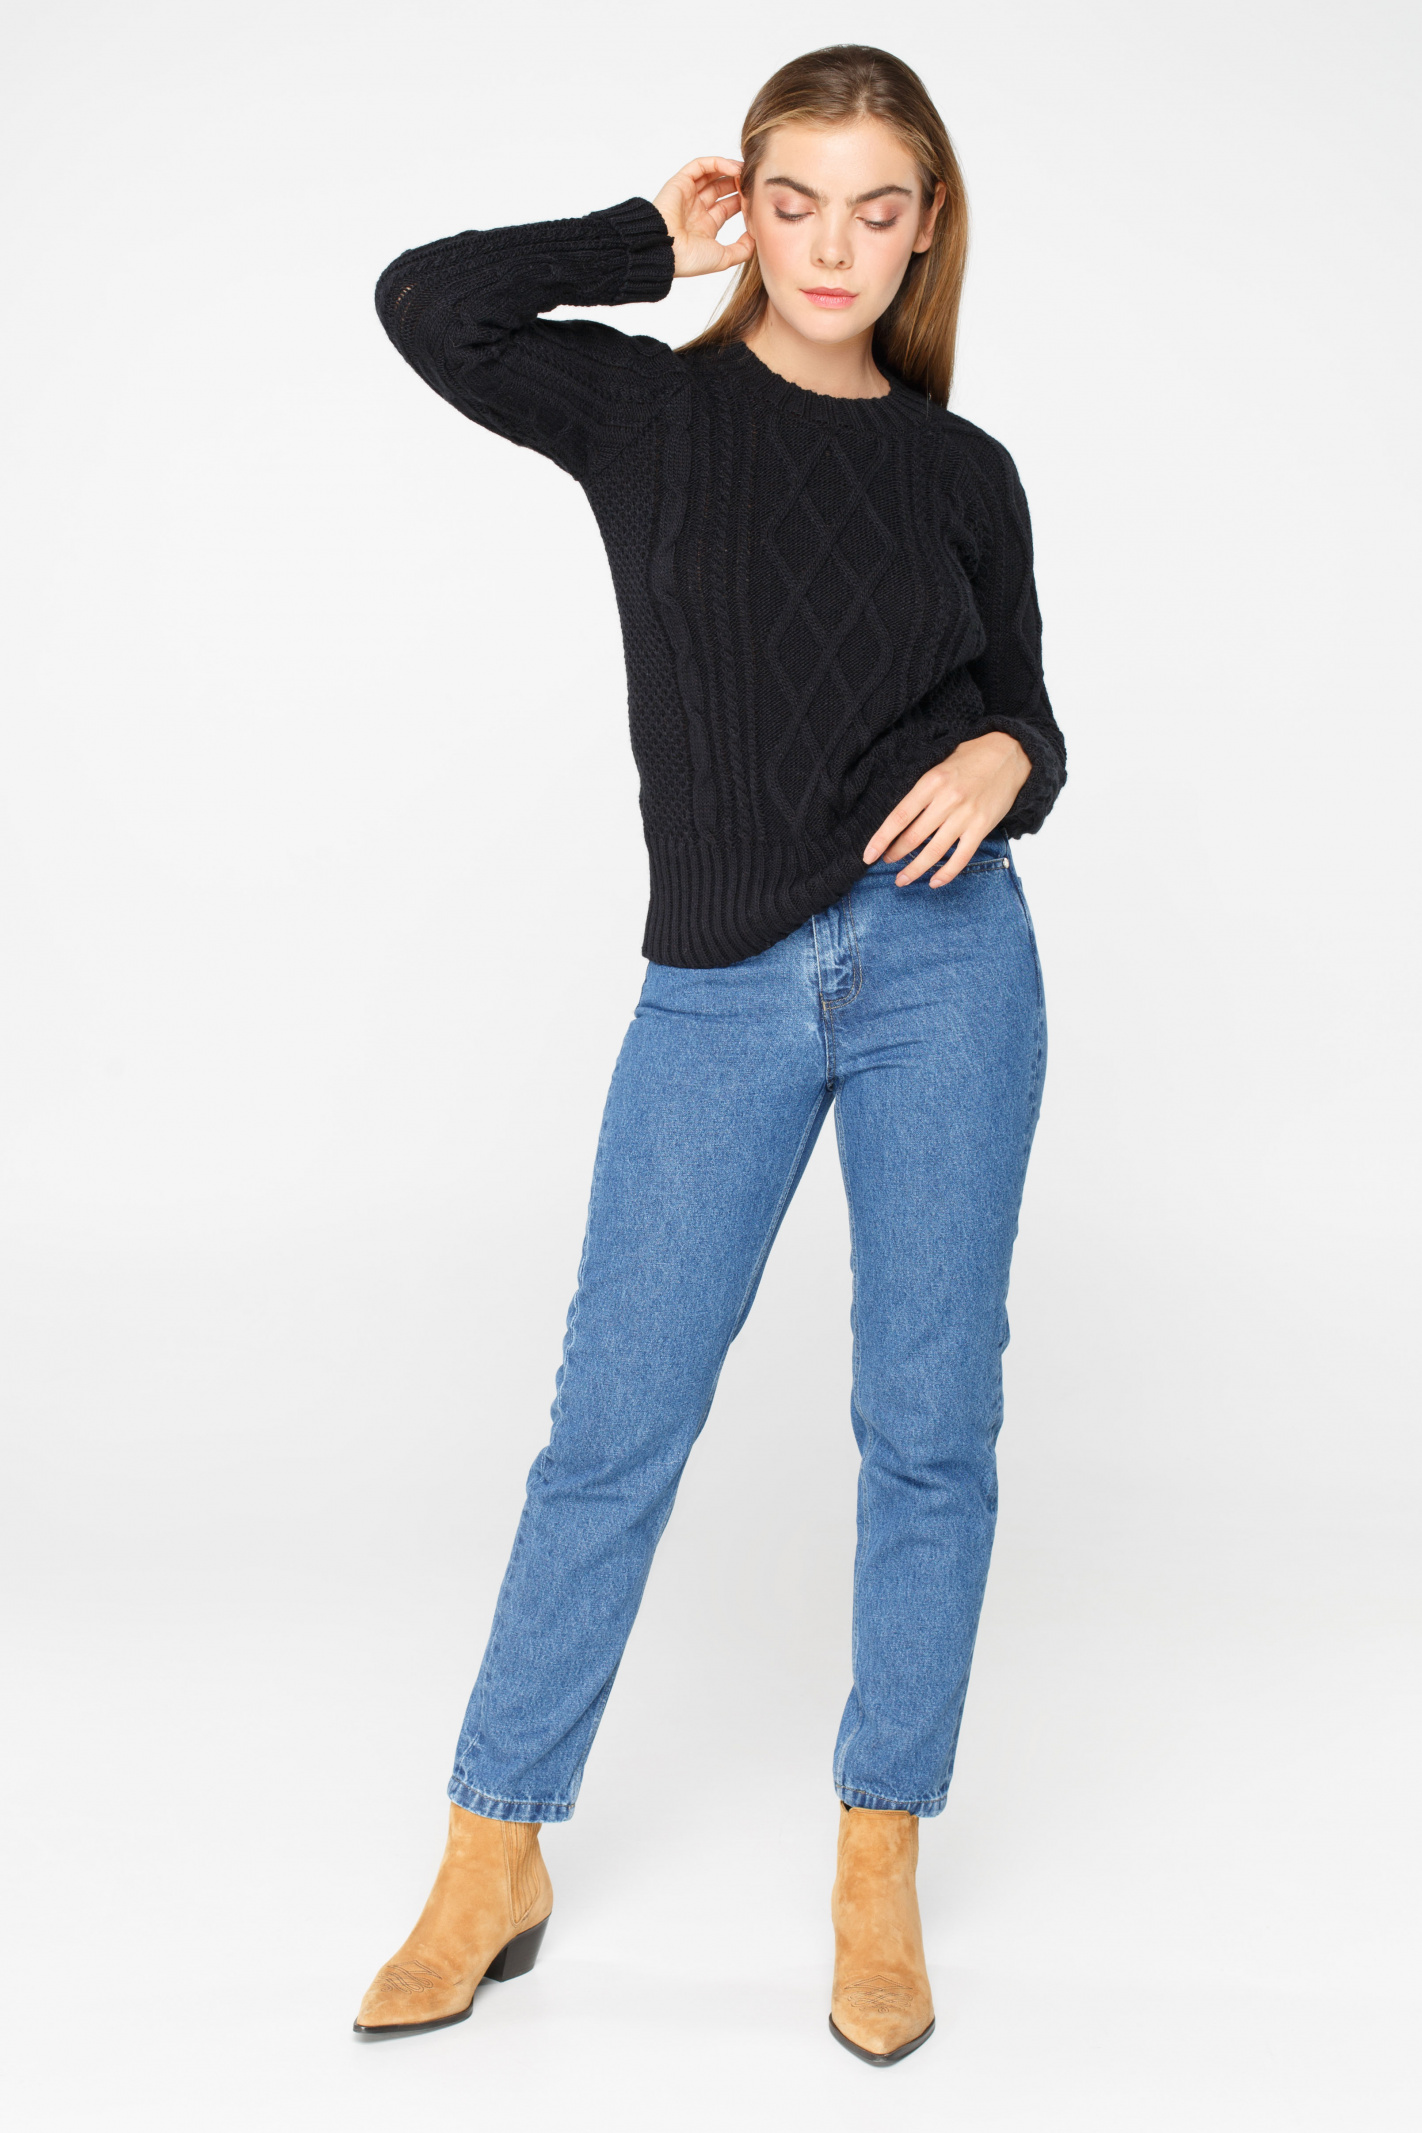 Свитер женские MustHave модель 7438 , 2017